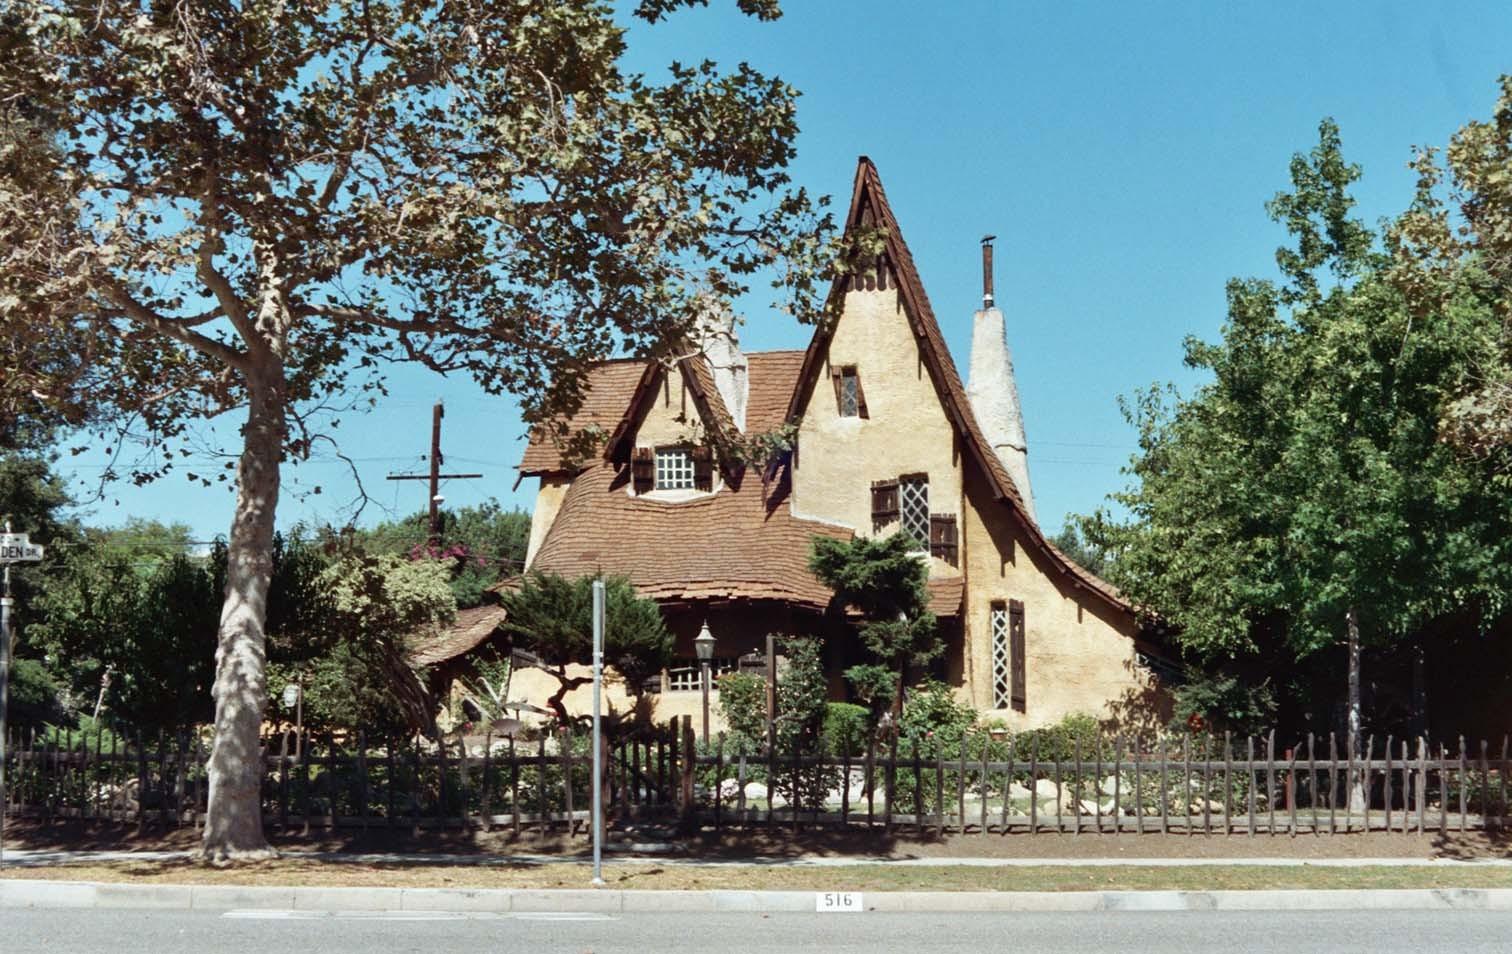 Spadena-Haus um 1990